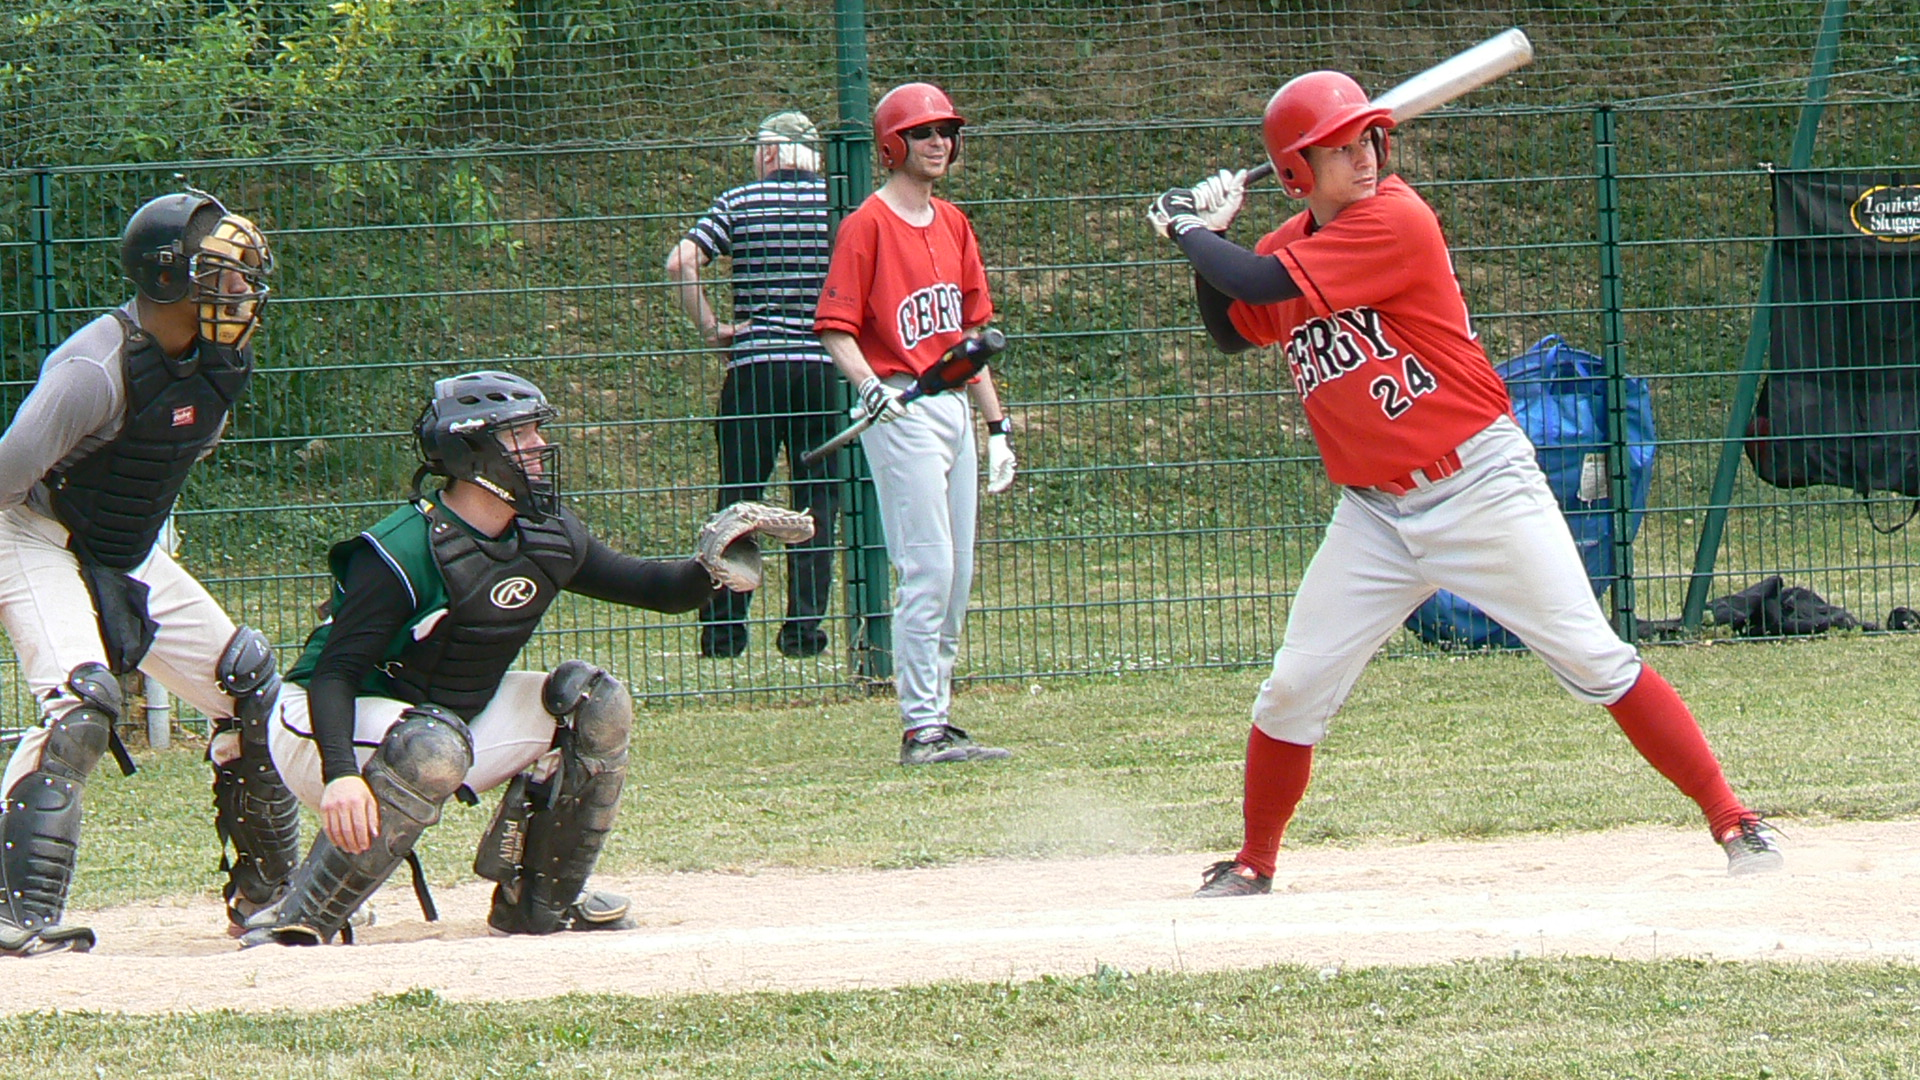 2011-05-08 vs Montigny (15)